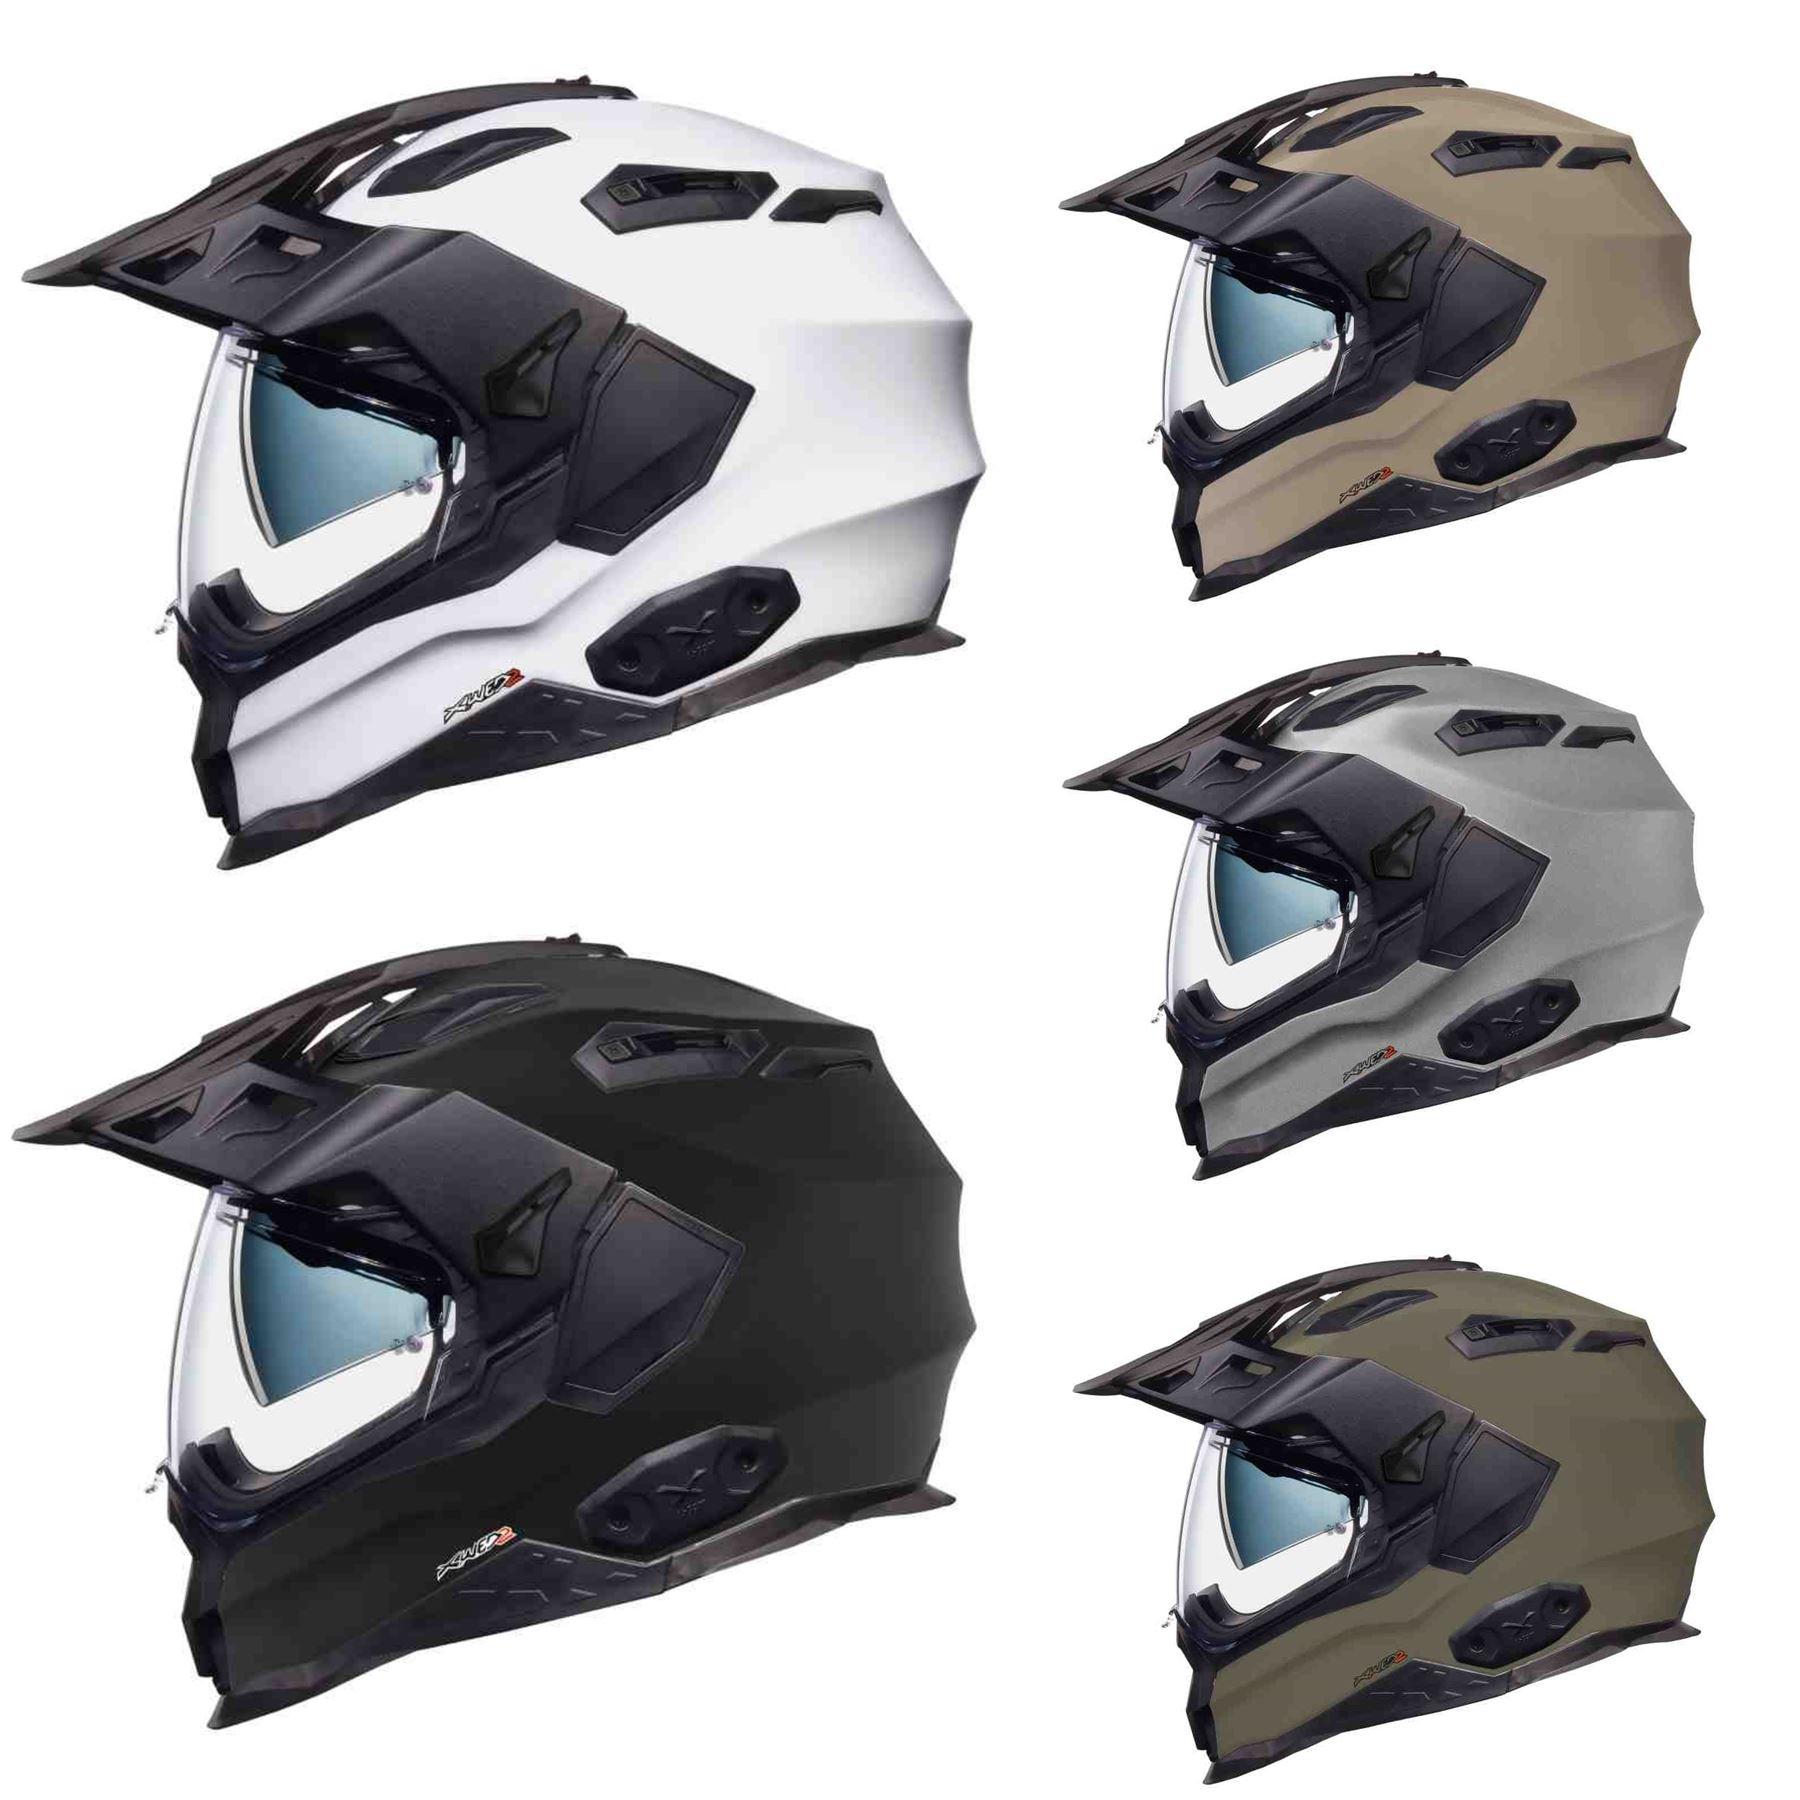 fb2d7968 Details about Nexx X.WED2 Adventure Motorcycle Helmet Sun Visor & Pinlock  All Colours